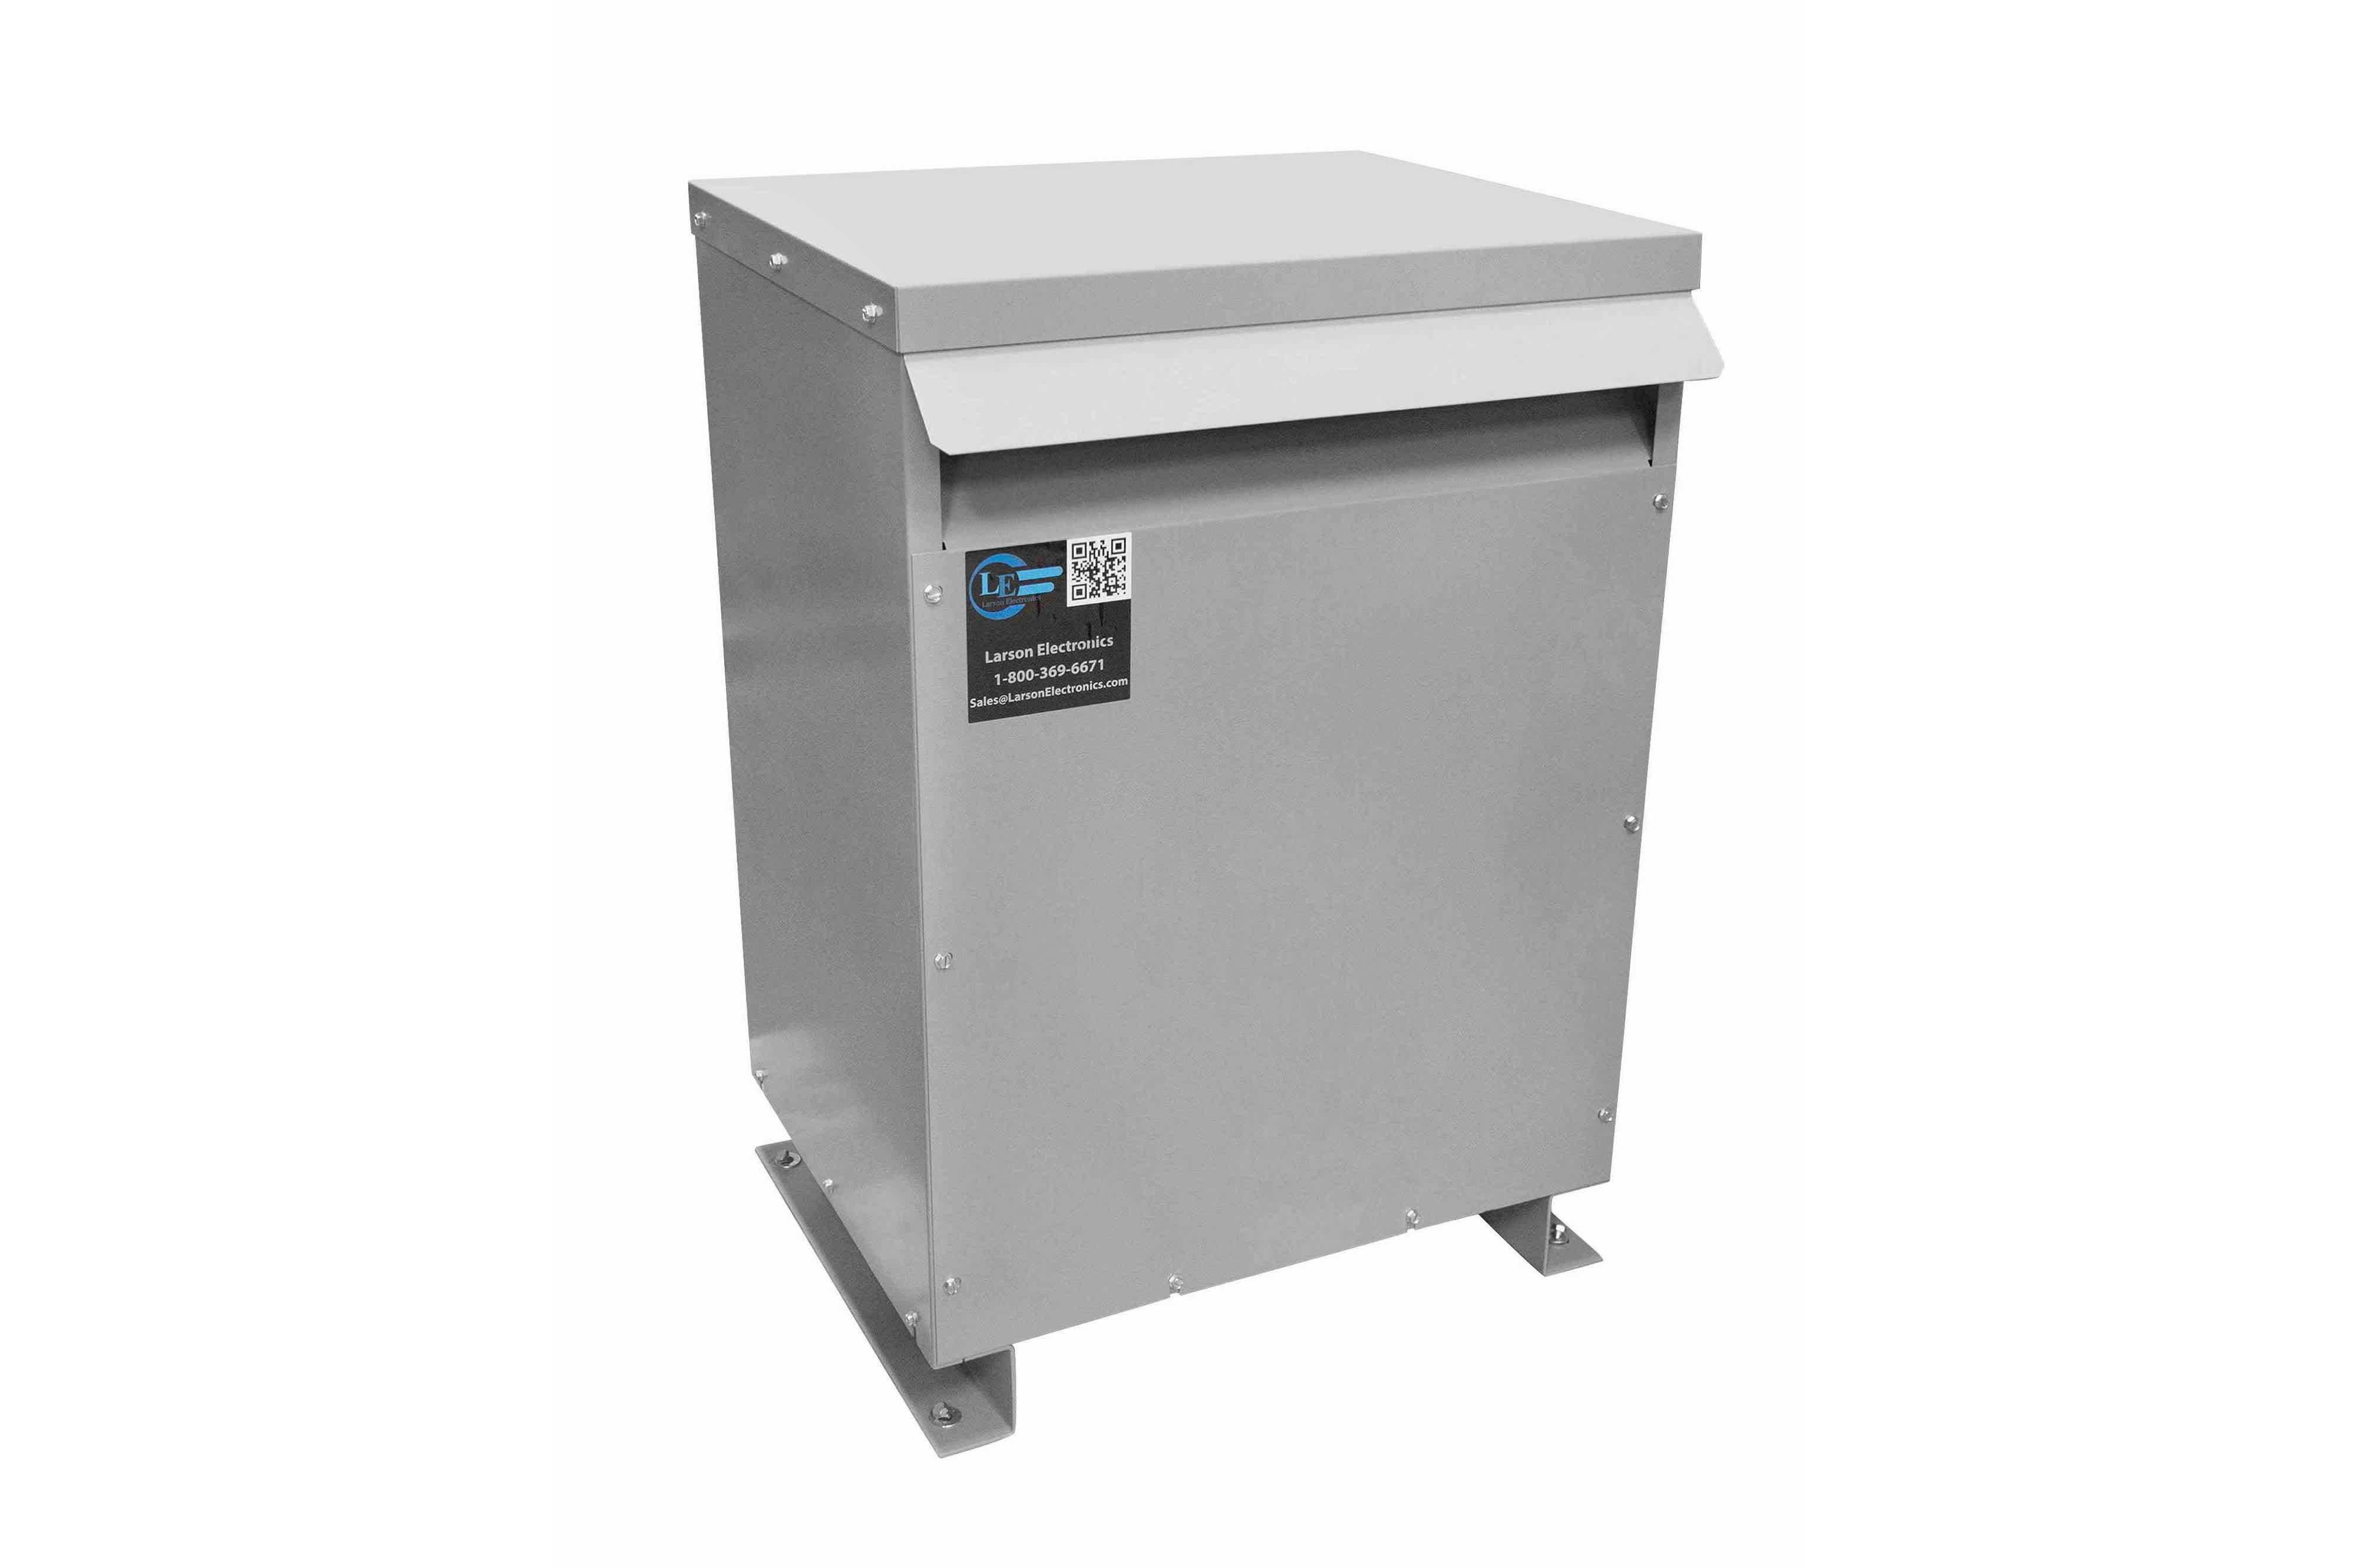 225 kVA 3PH Isolation Transformer, 460V Wye Primary, 400V Delta Secondary, N3R, Ventilated, 60 Hz